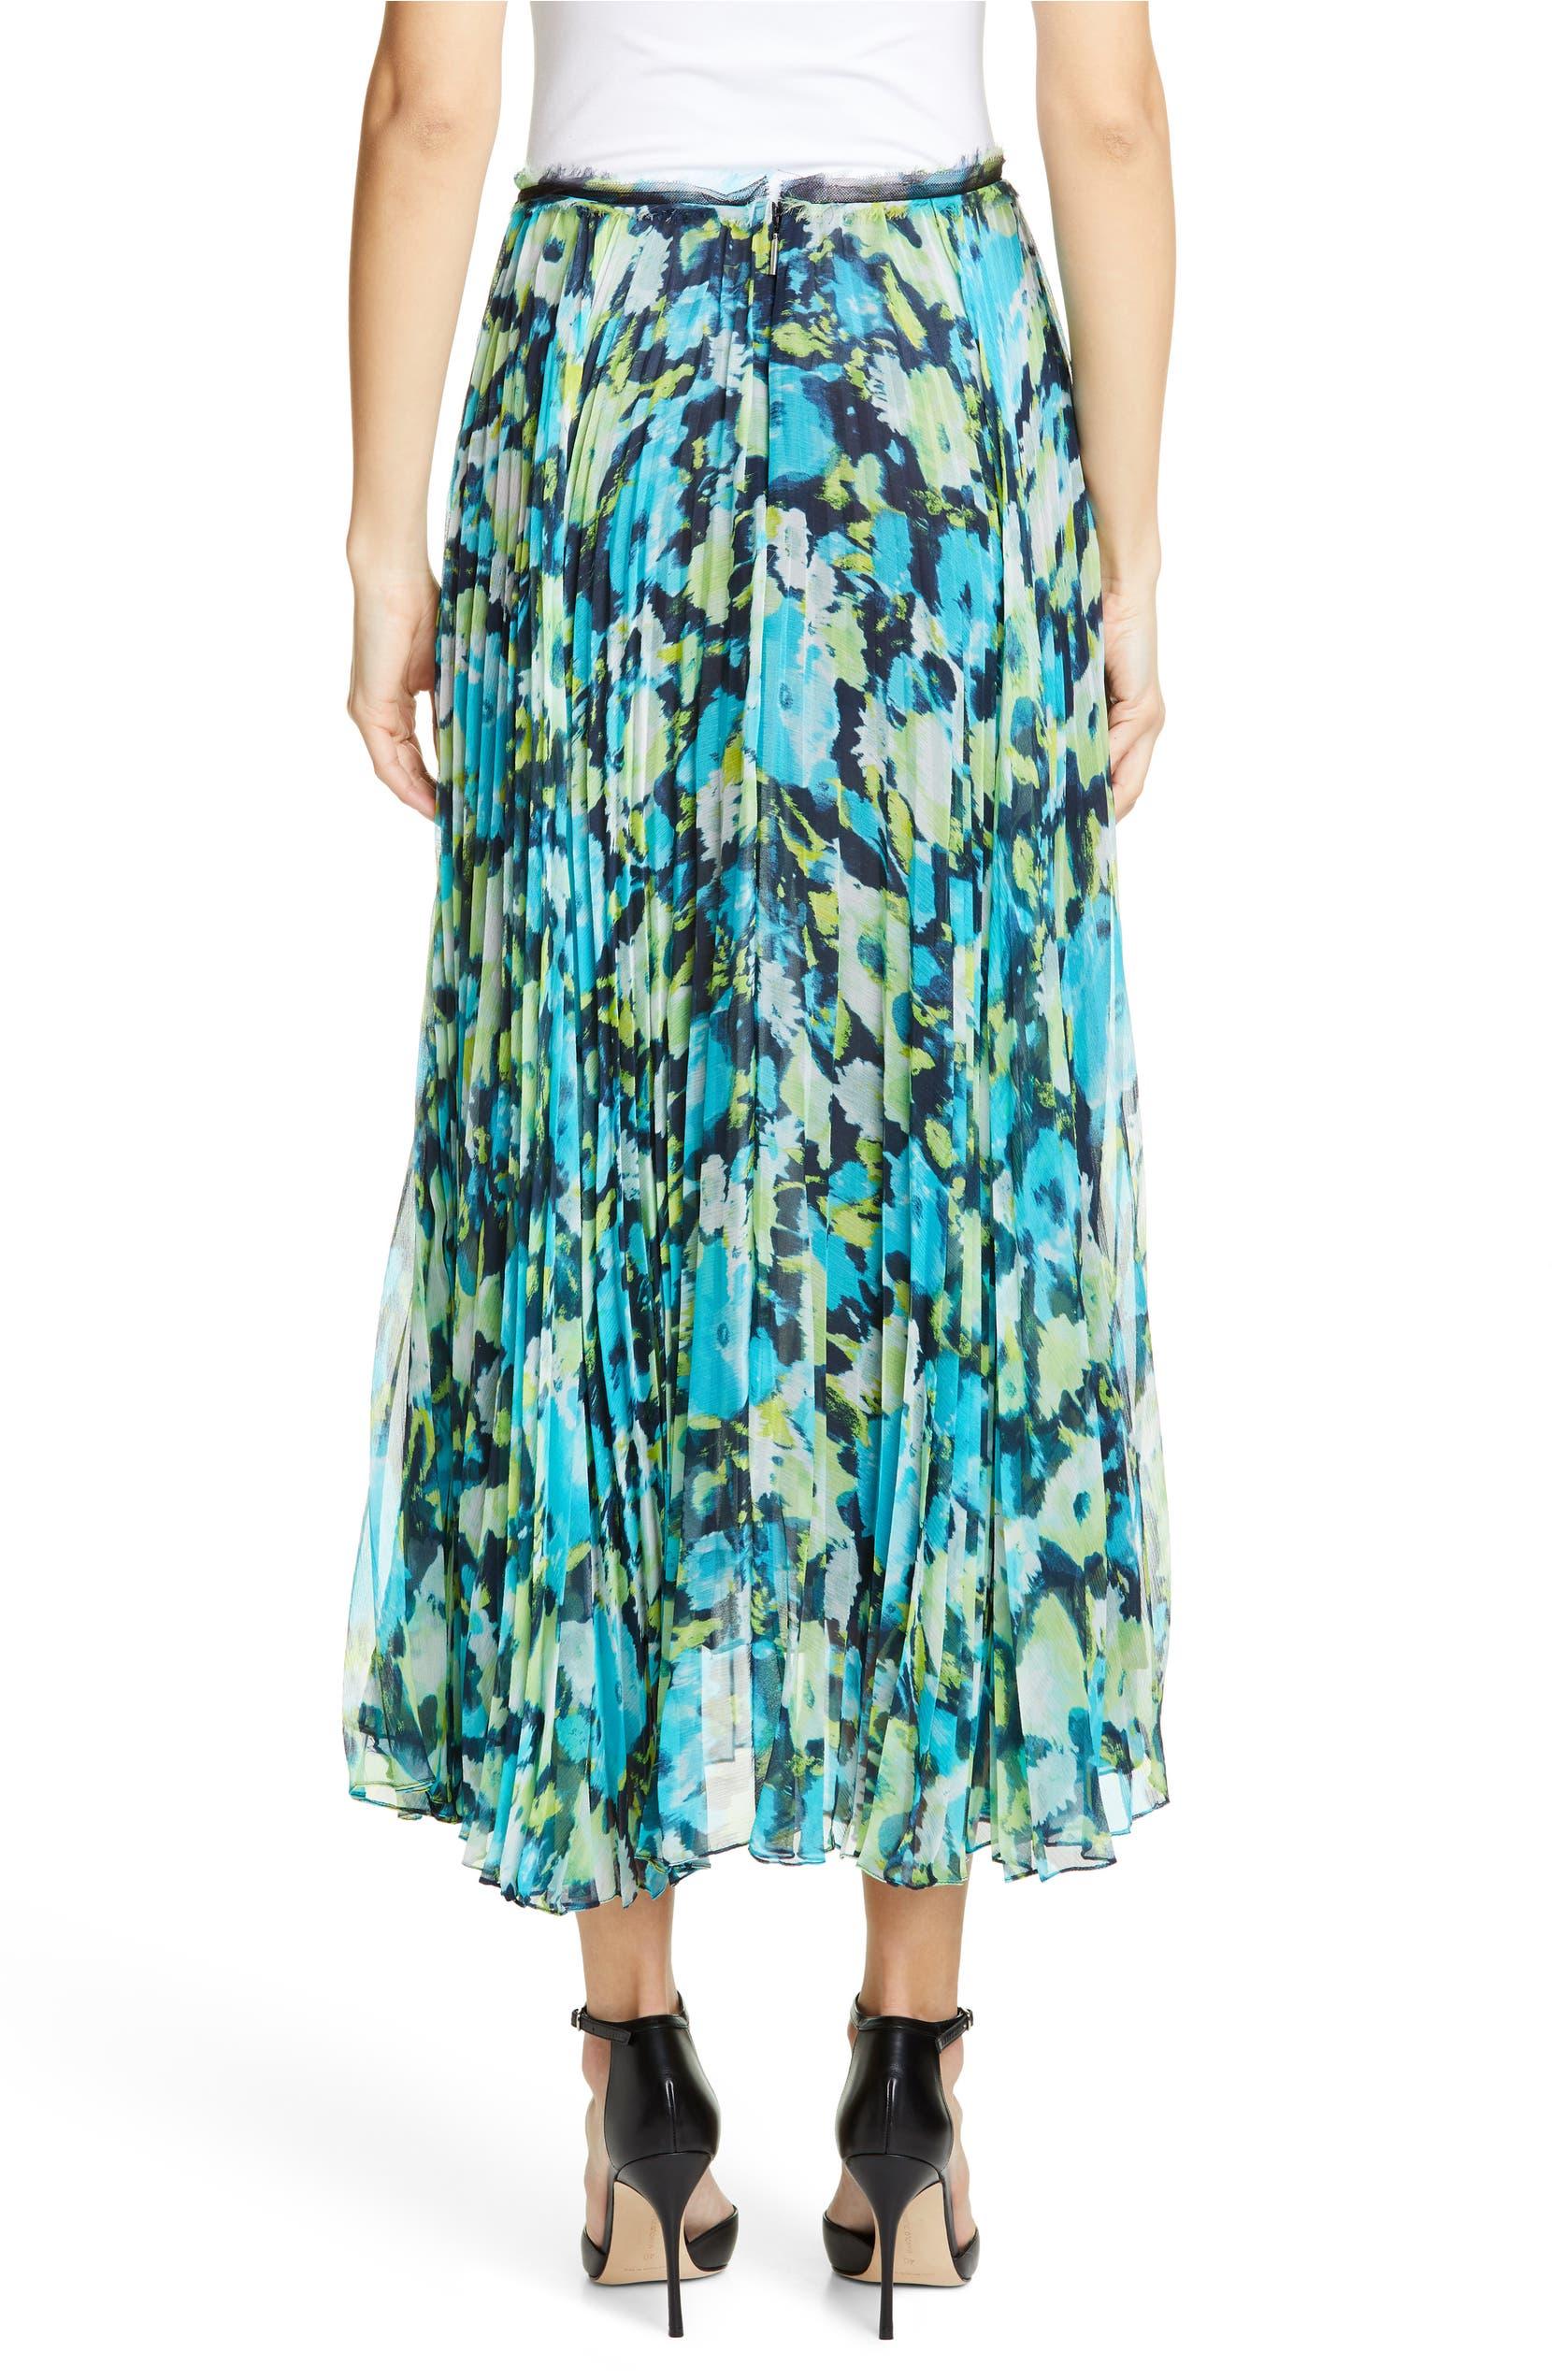 da6f7abb5 Jason Wu Collection Floral Print Pleated Chiffon Skirt | Nordstrom